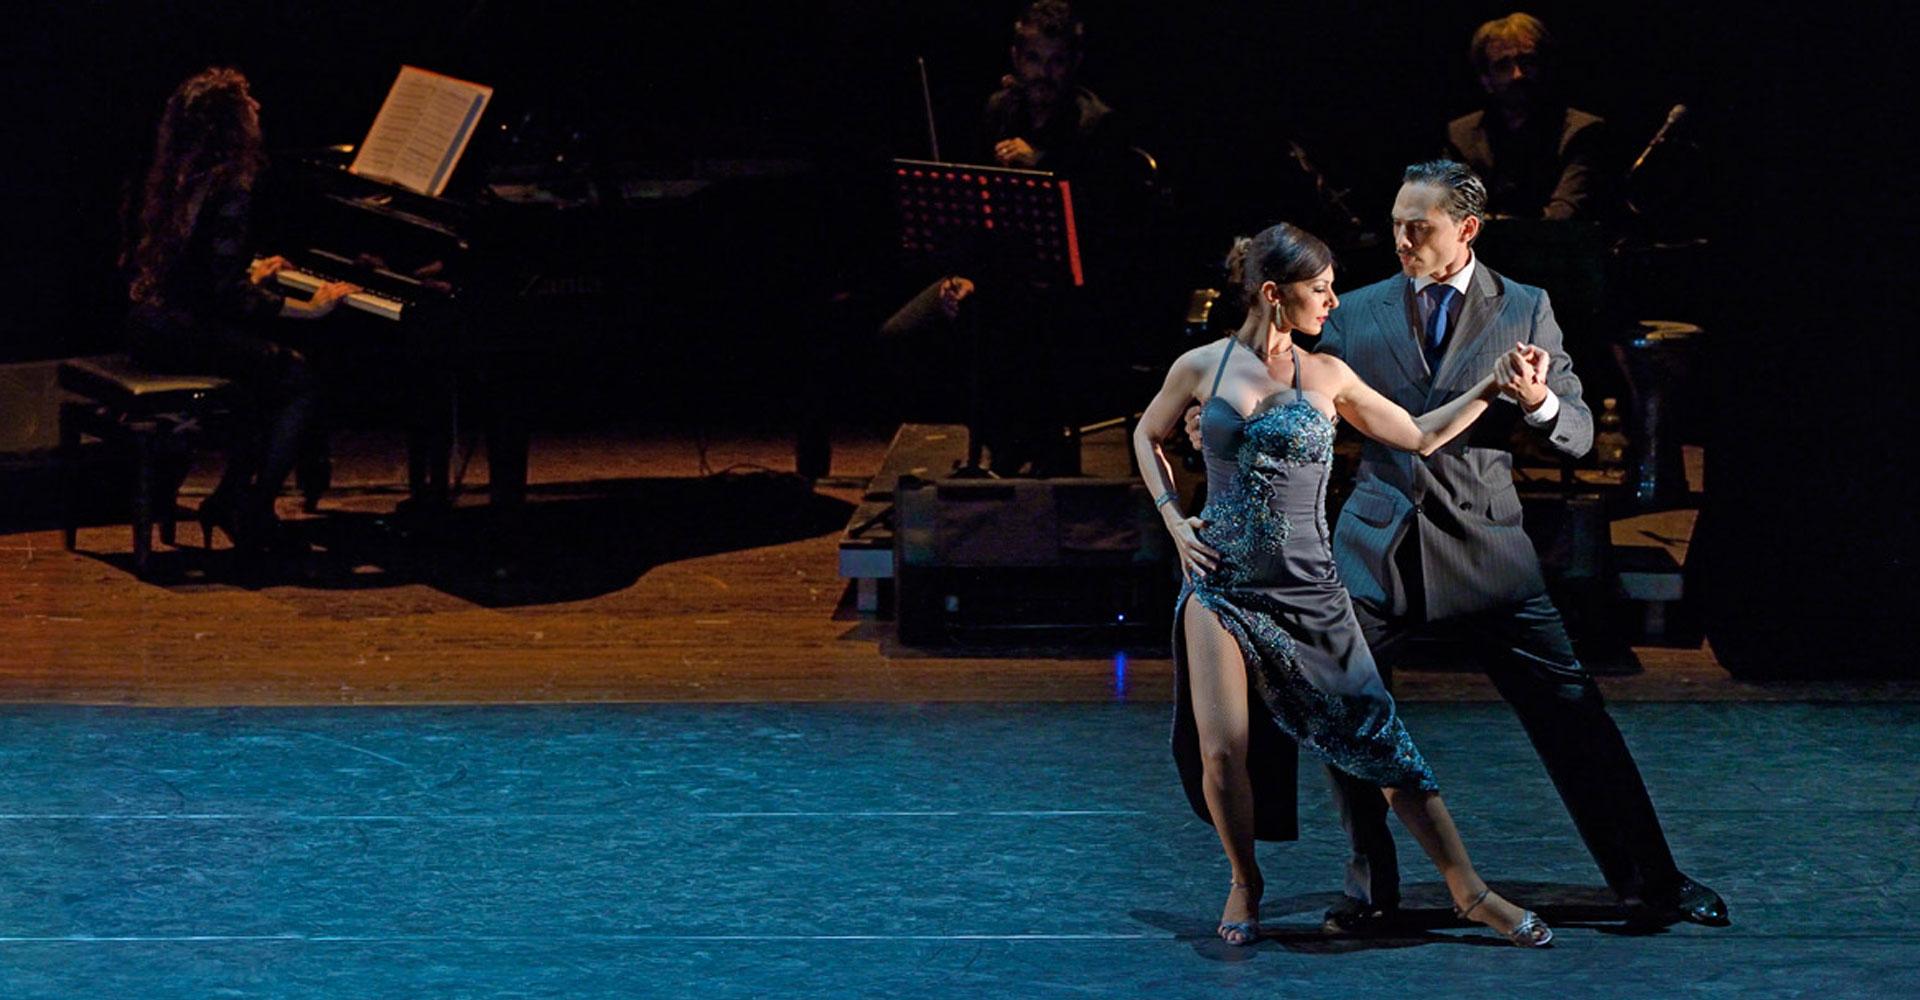 mitico-tango-rev_slider-08